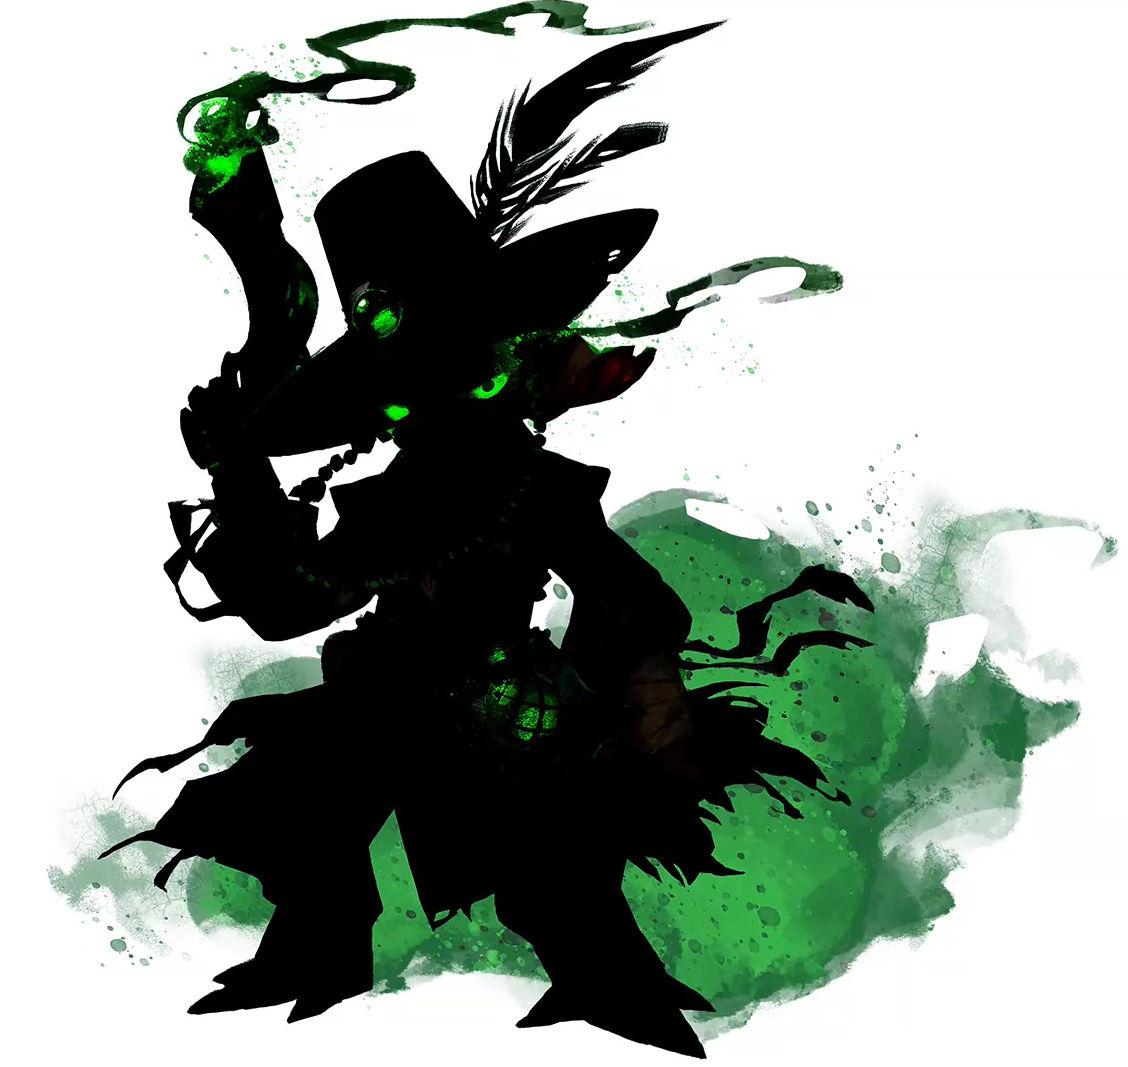 Guild Wars 2 end of dragons GW2 End of Dragons Nuova elite specialization Necromancer